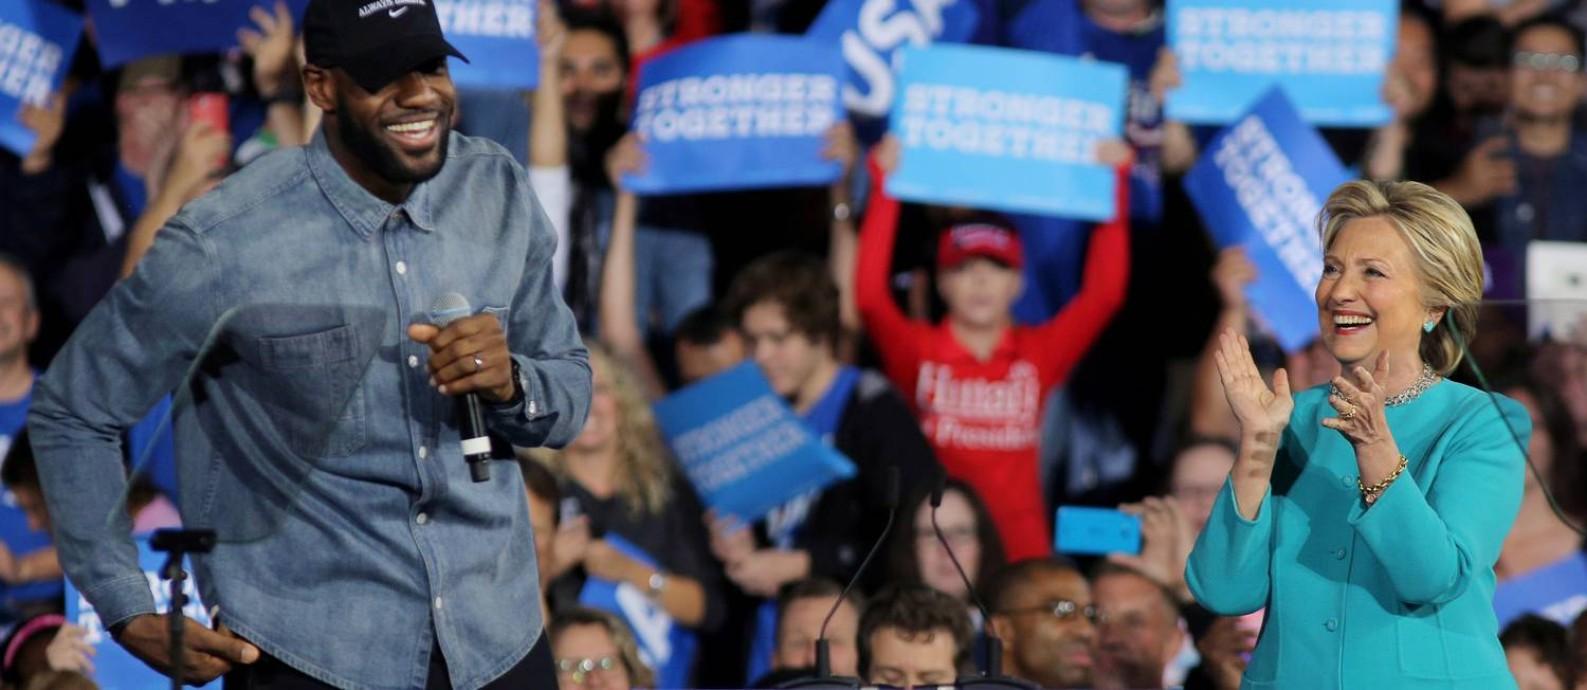 LeBron durante a corrida presidencial de 2016, ao lado de Hillary Clinton; em 2020, ele lidera movimento sobre importância de votar Foto: Carlos Barria / REUTERS